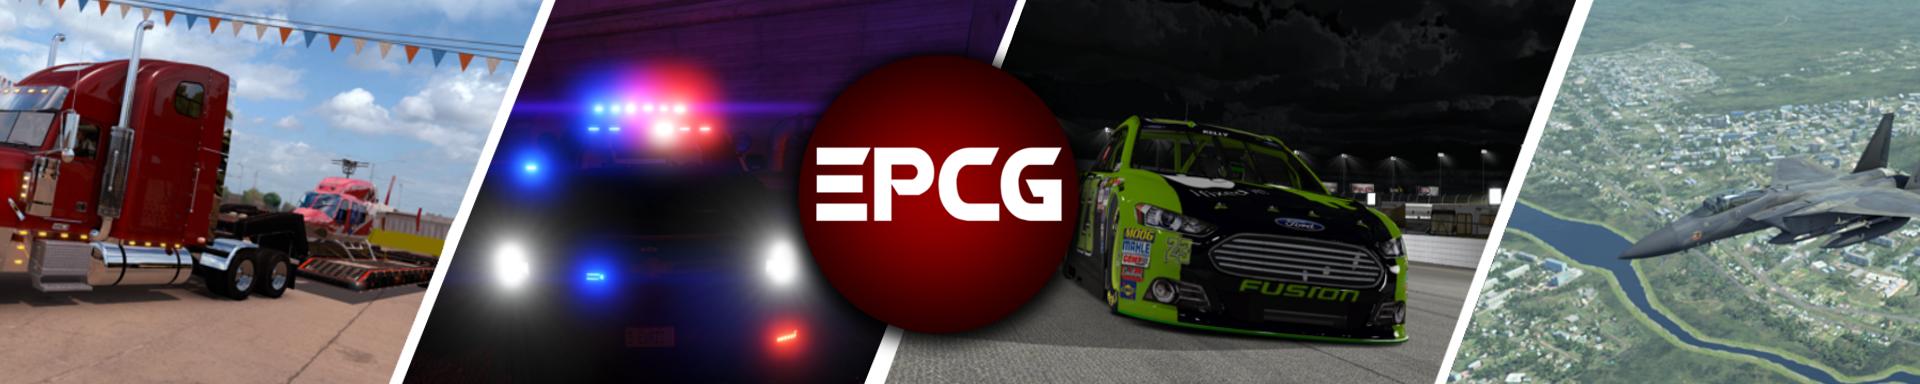 Evol PC Gaming